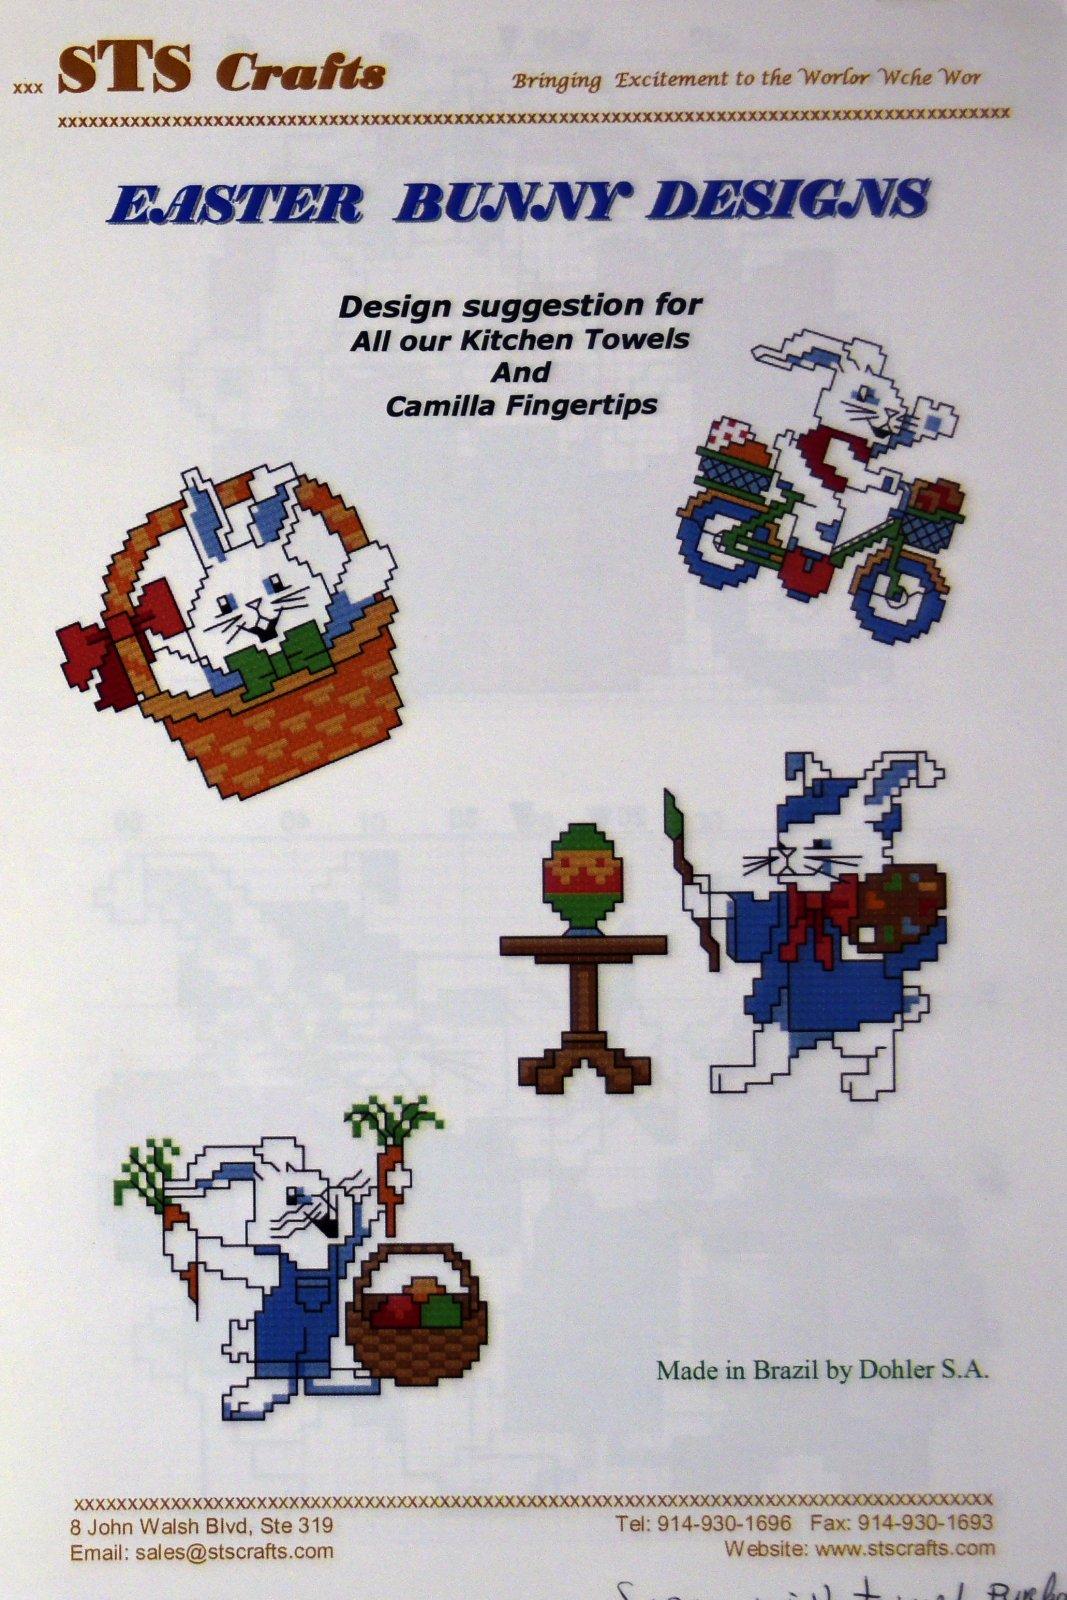 Easter Bunny Designs